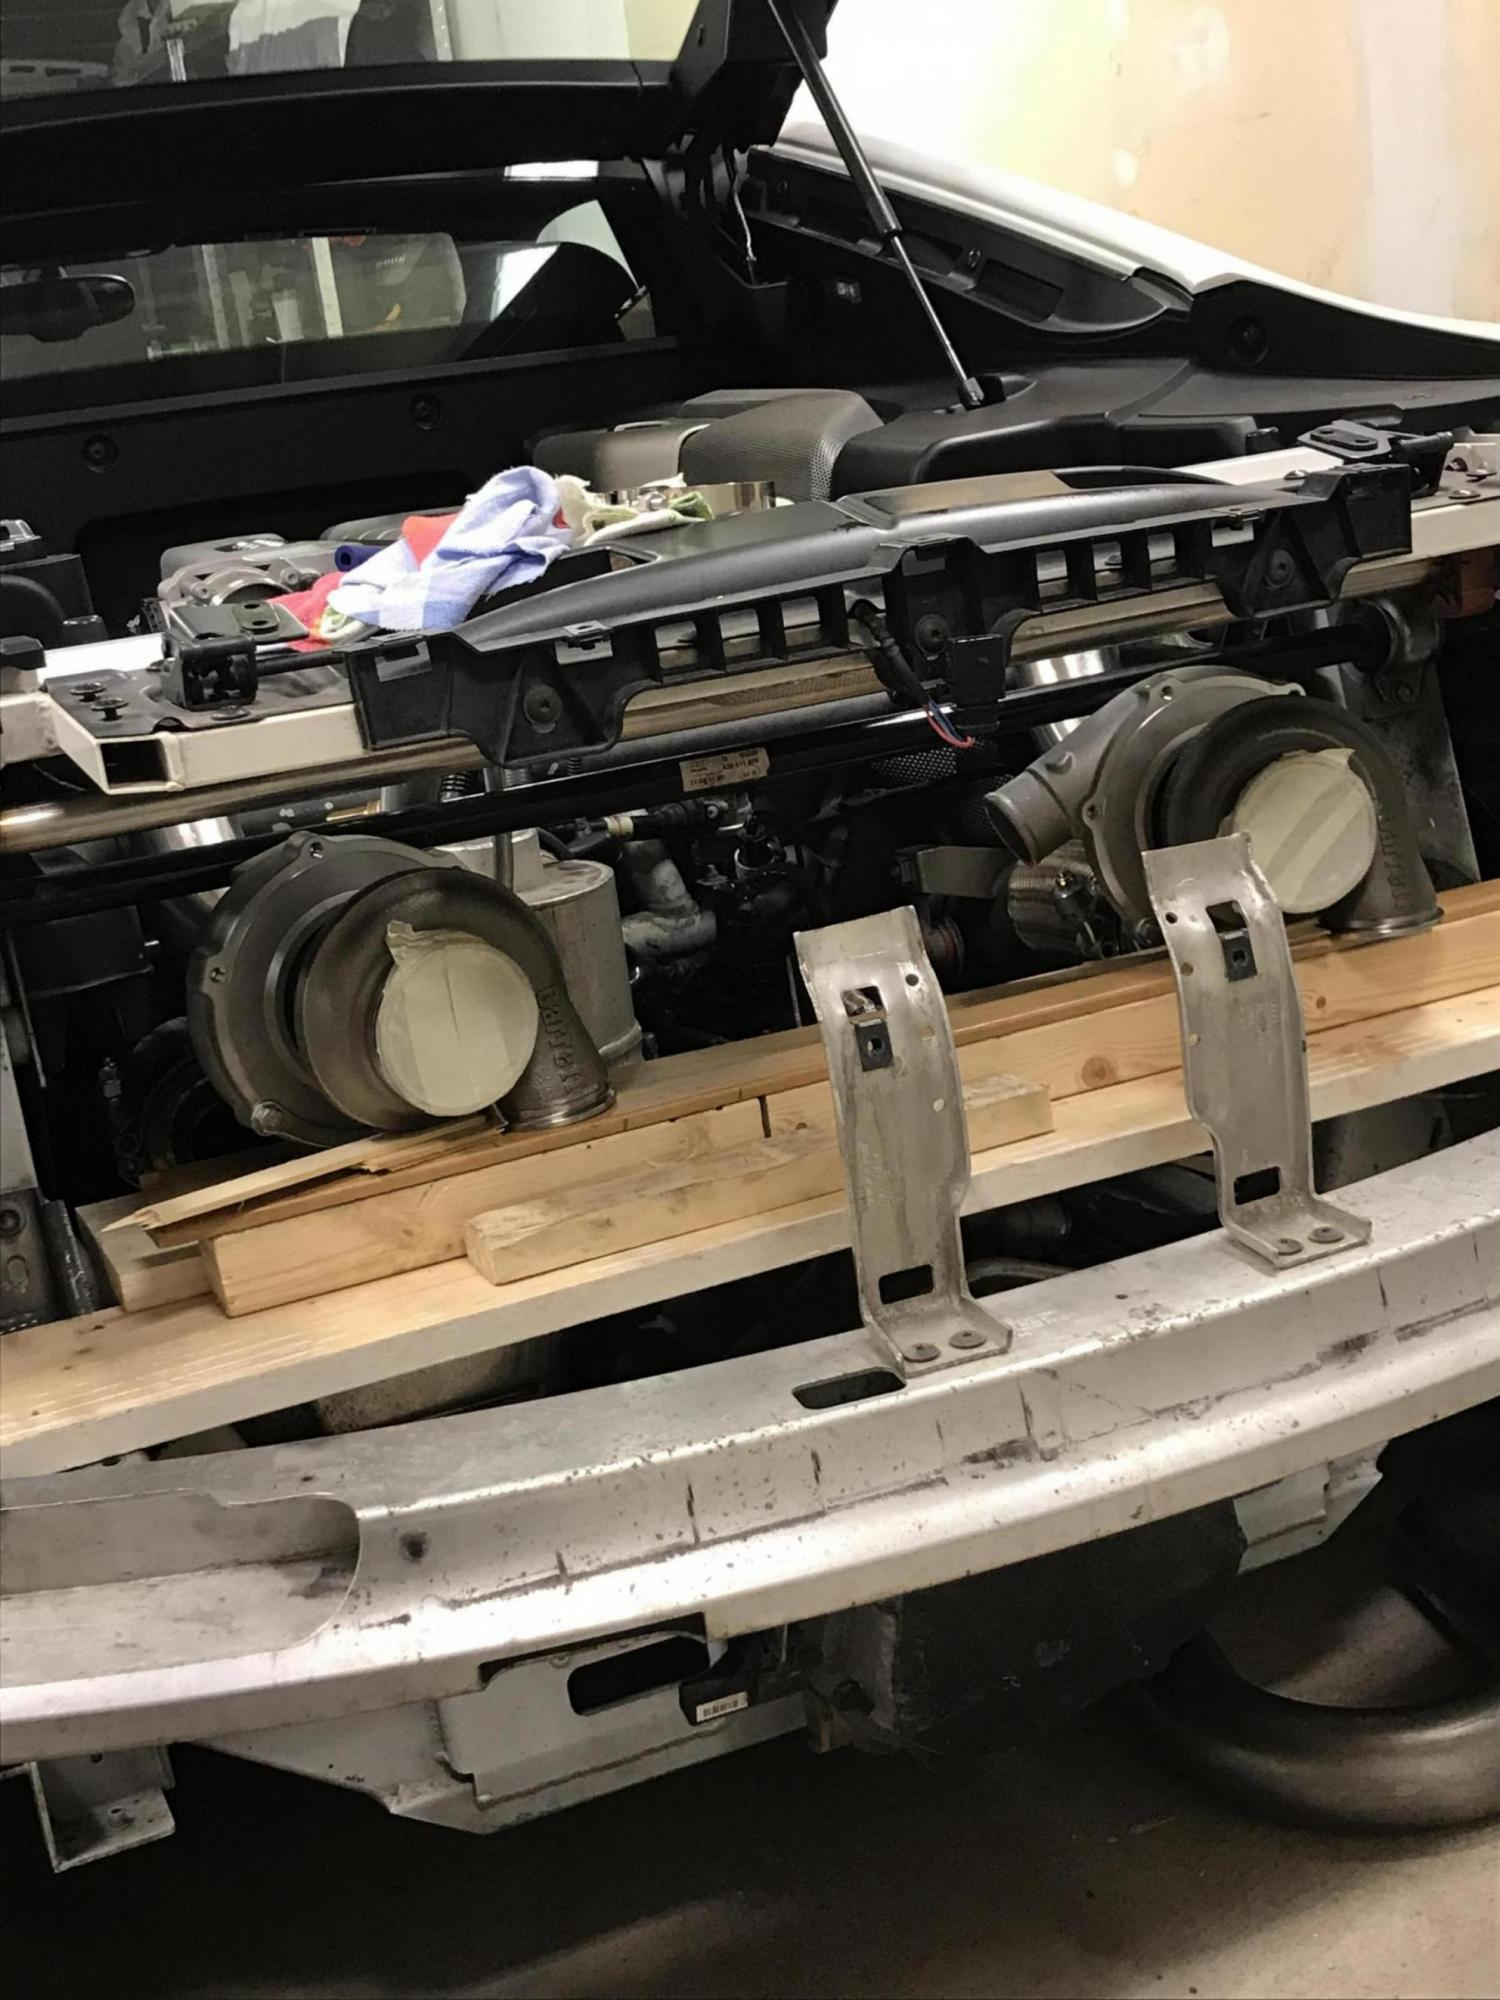 R8 v8 turbo project-img_5088_1540115106190.jpg